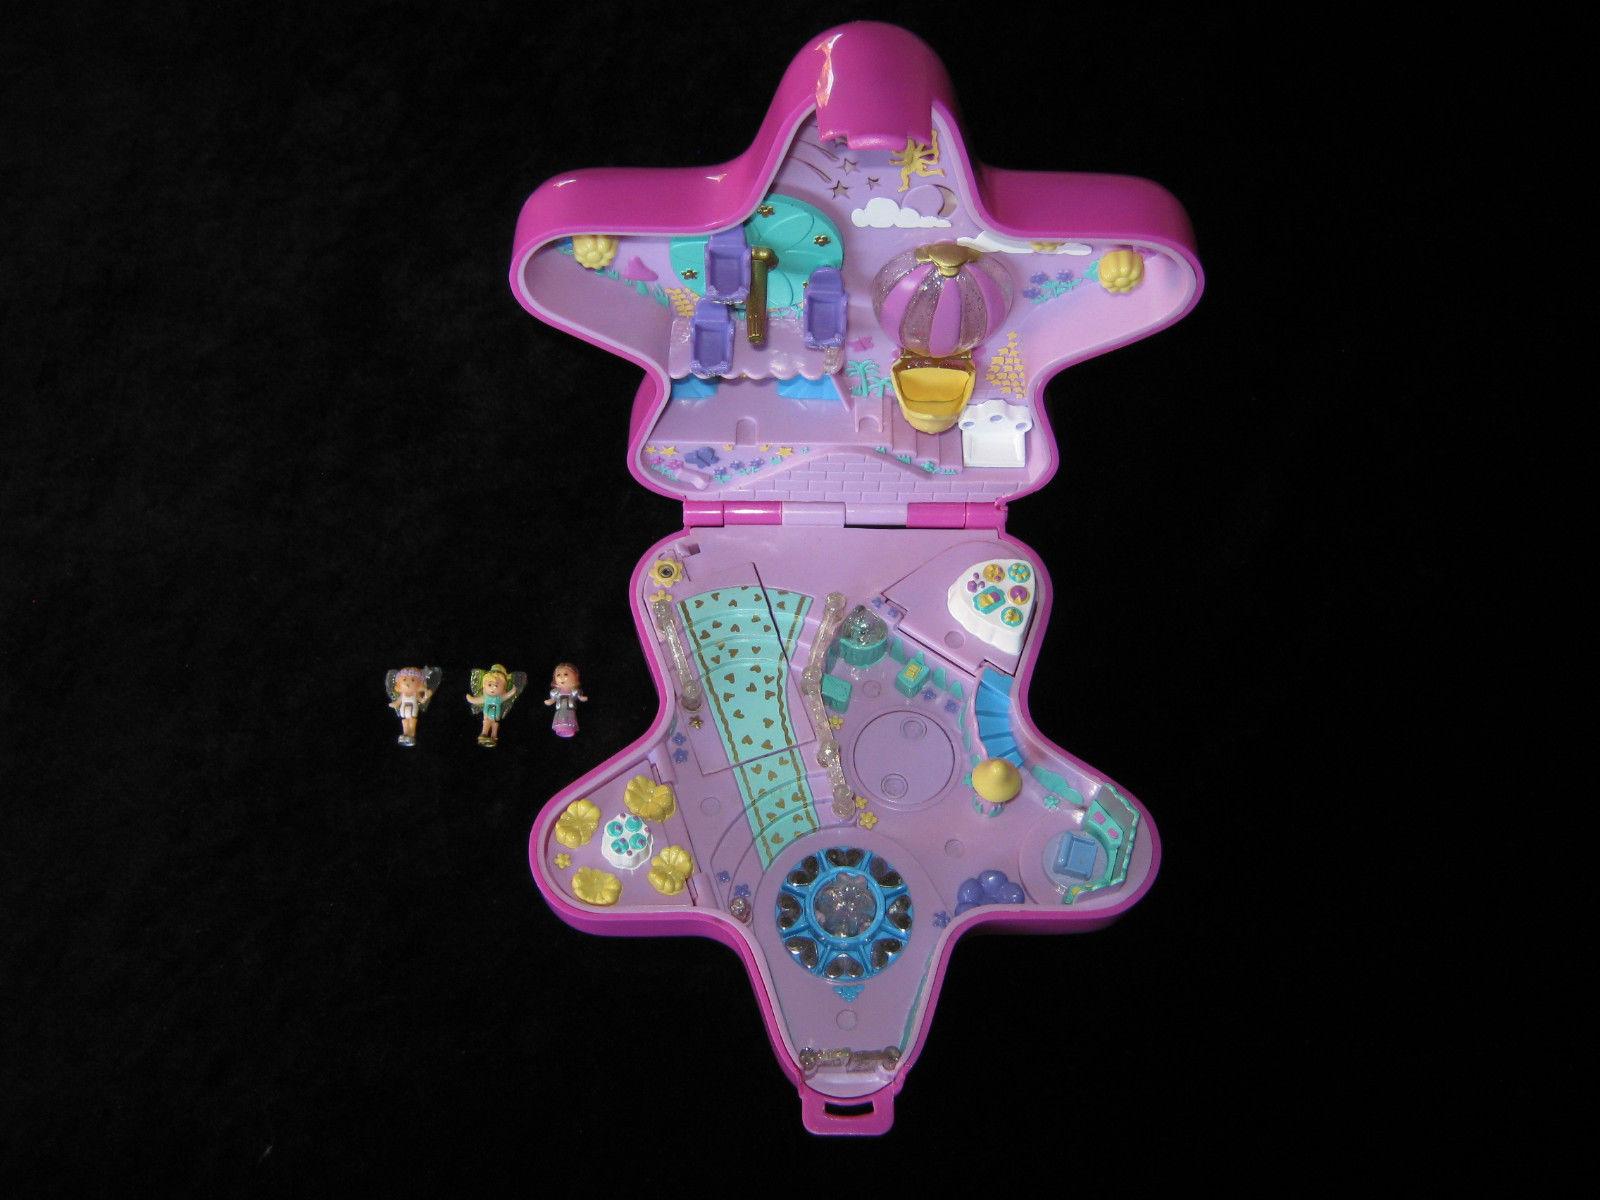 Vintage Polly Pocket toy